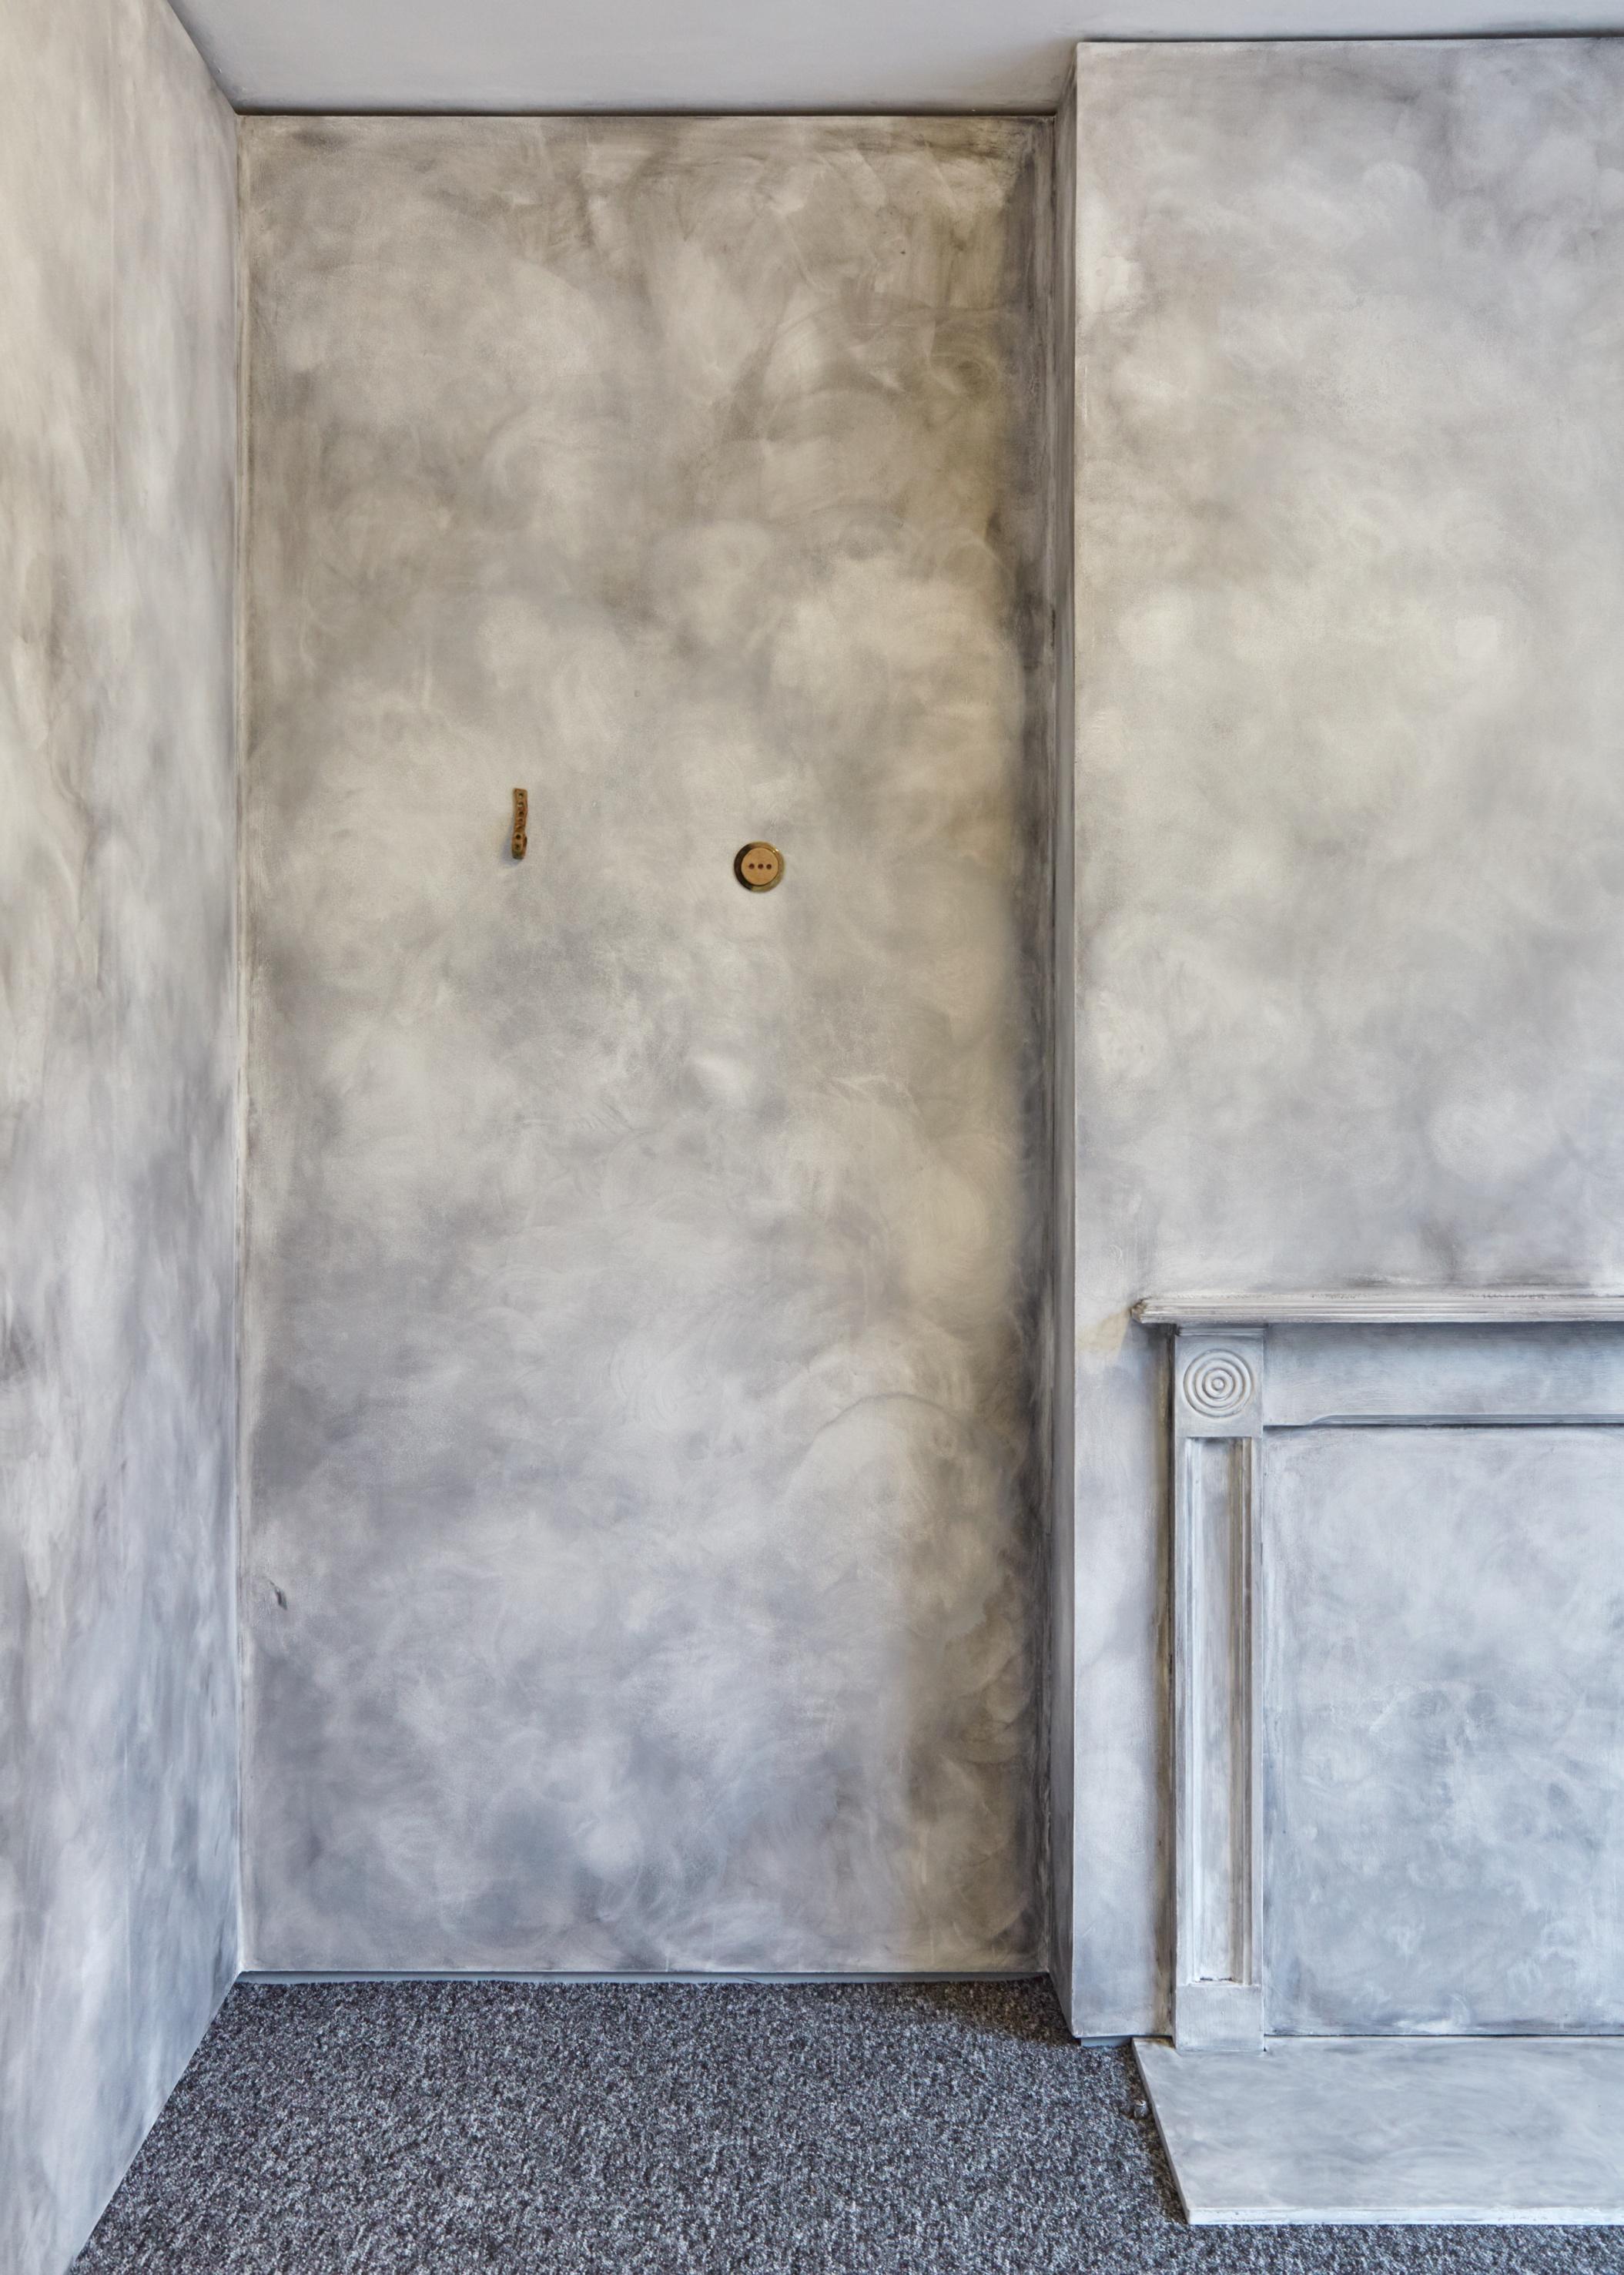 Marcello, 2018 glazed stoneware ceramic 10.5 x 2 x 3.2 cm  Ophelia, 2018 glazed stoneware ceramic 7.3 x 7.3 x 1.3 cm